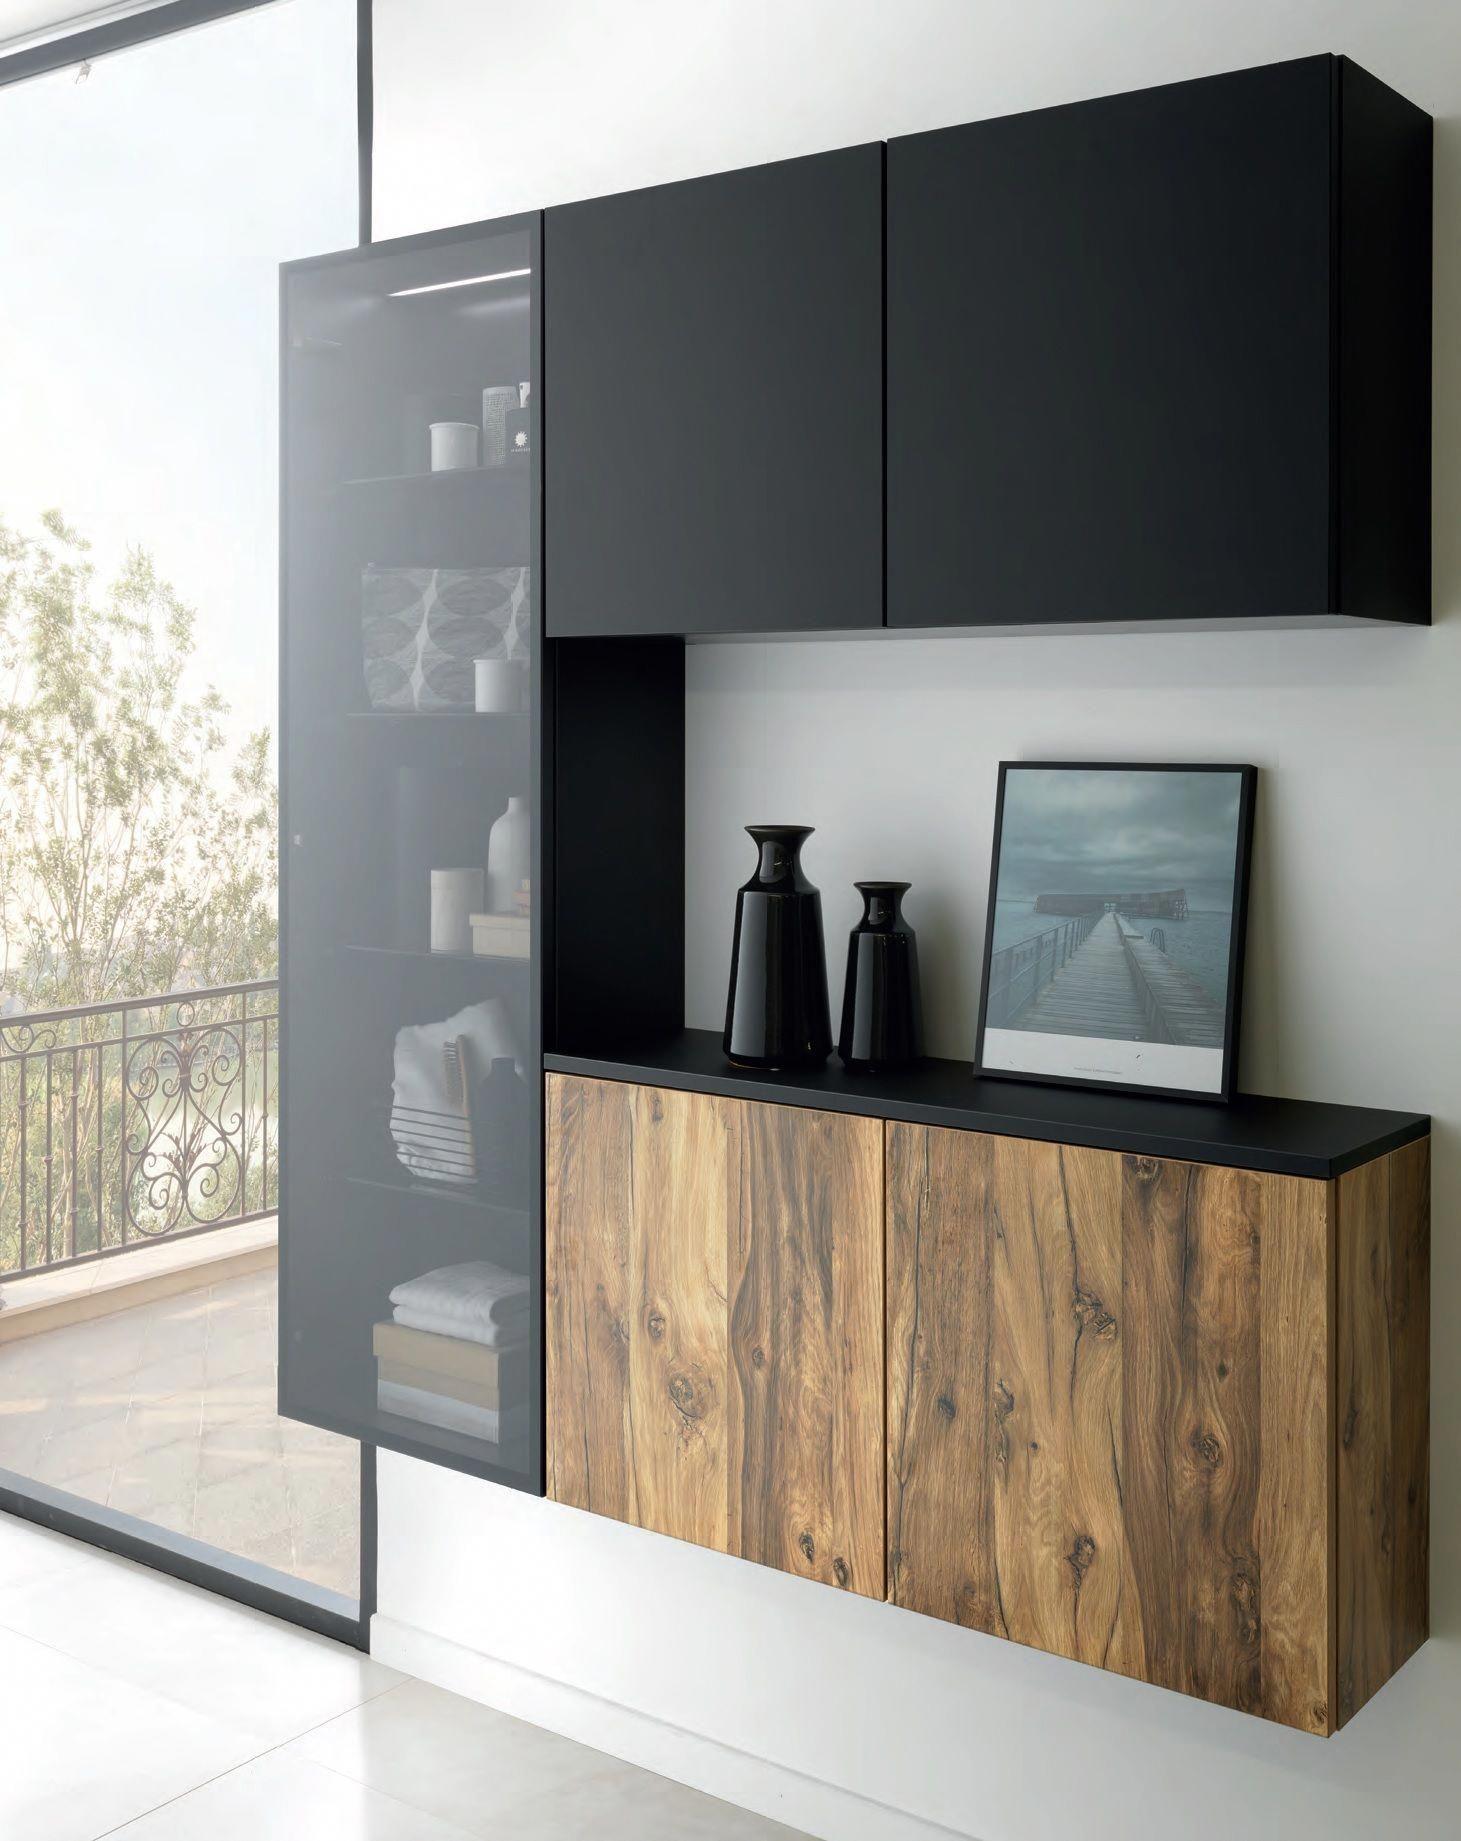 Living Room Themes | Modern Decor Ideas | Lounge Design ...